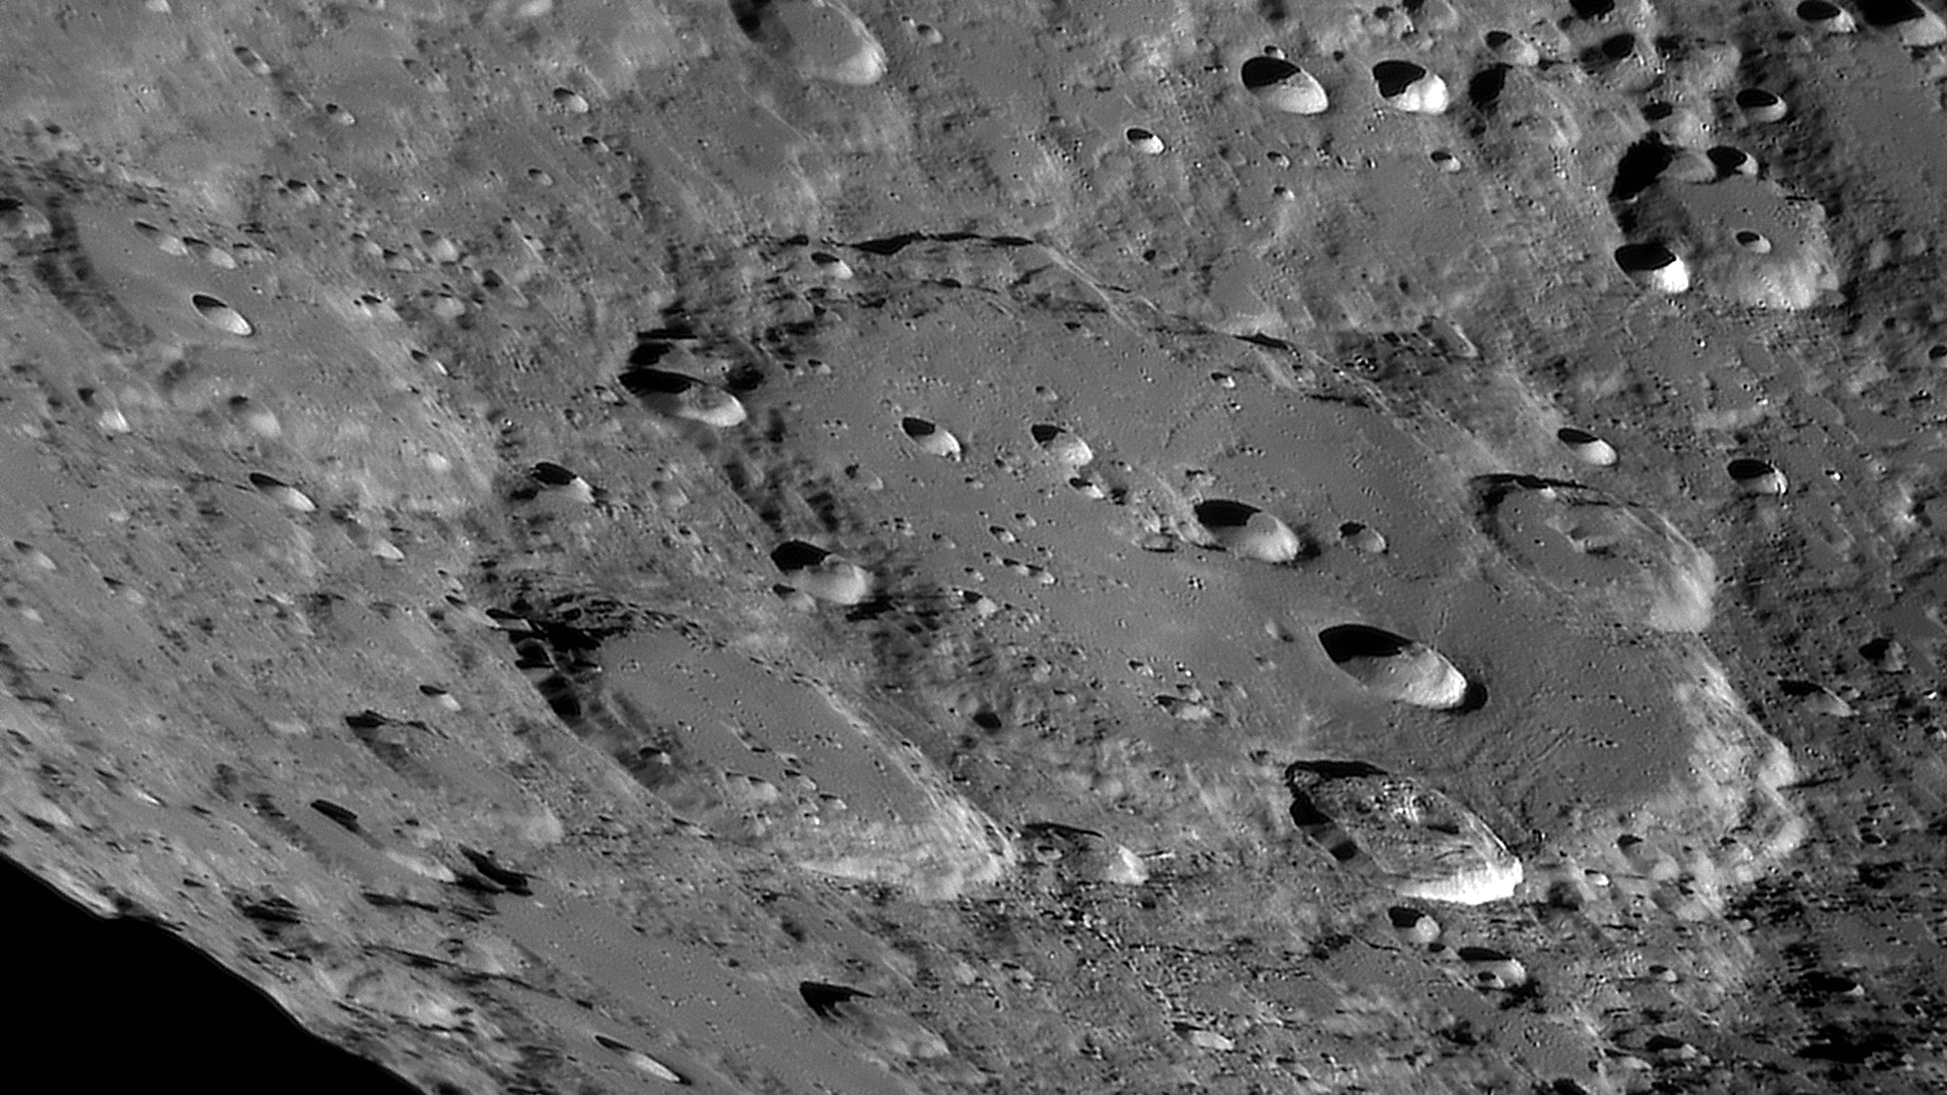 large.moon_23_07_2019_04_22_32_C1.jpg.95d92a3e7f85c4f2a95b925cec1137db.jpg